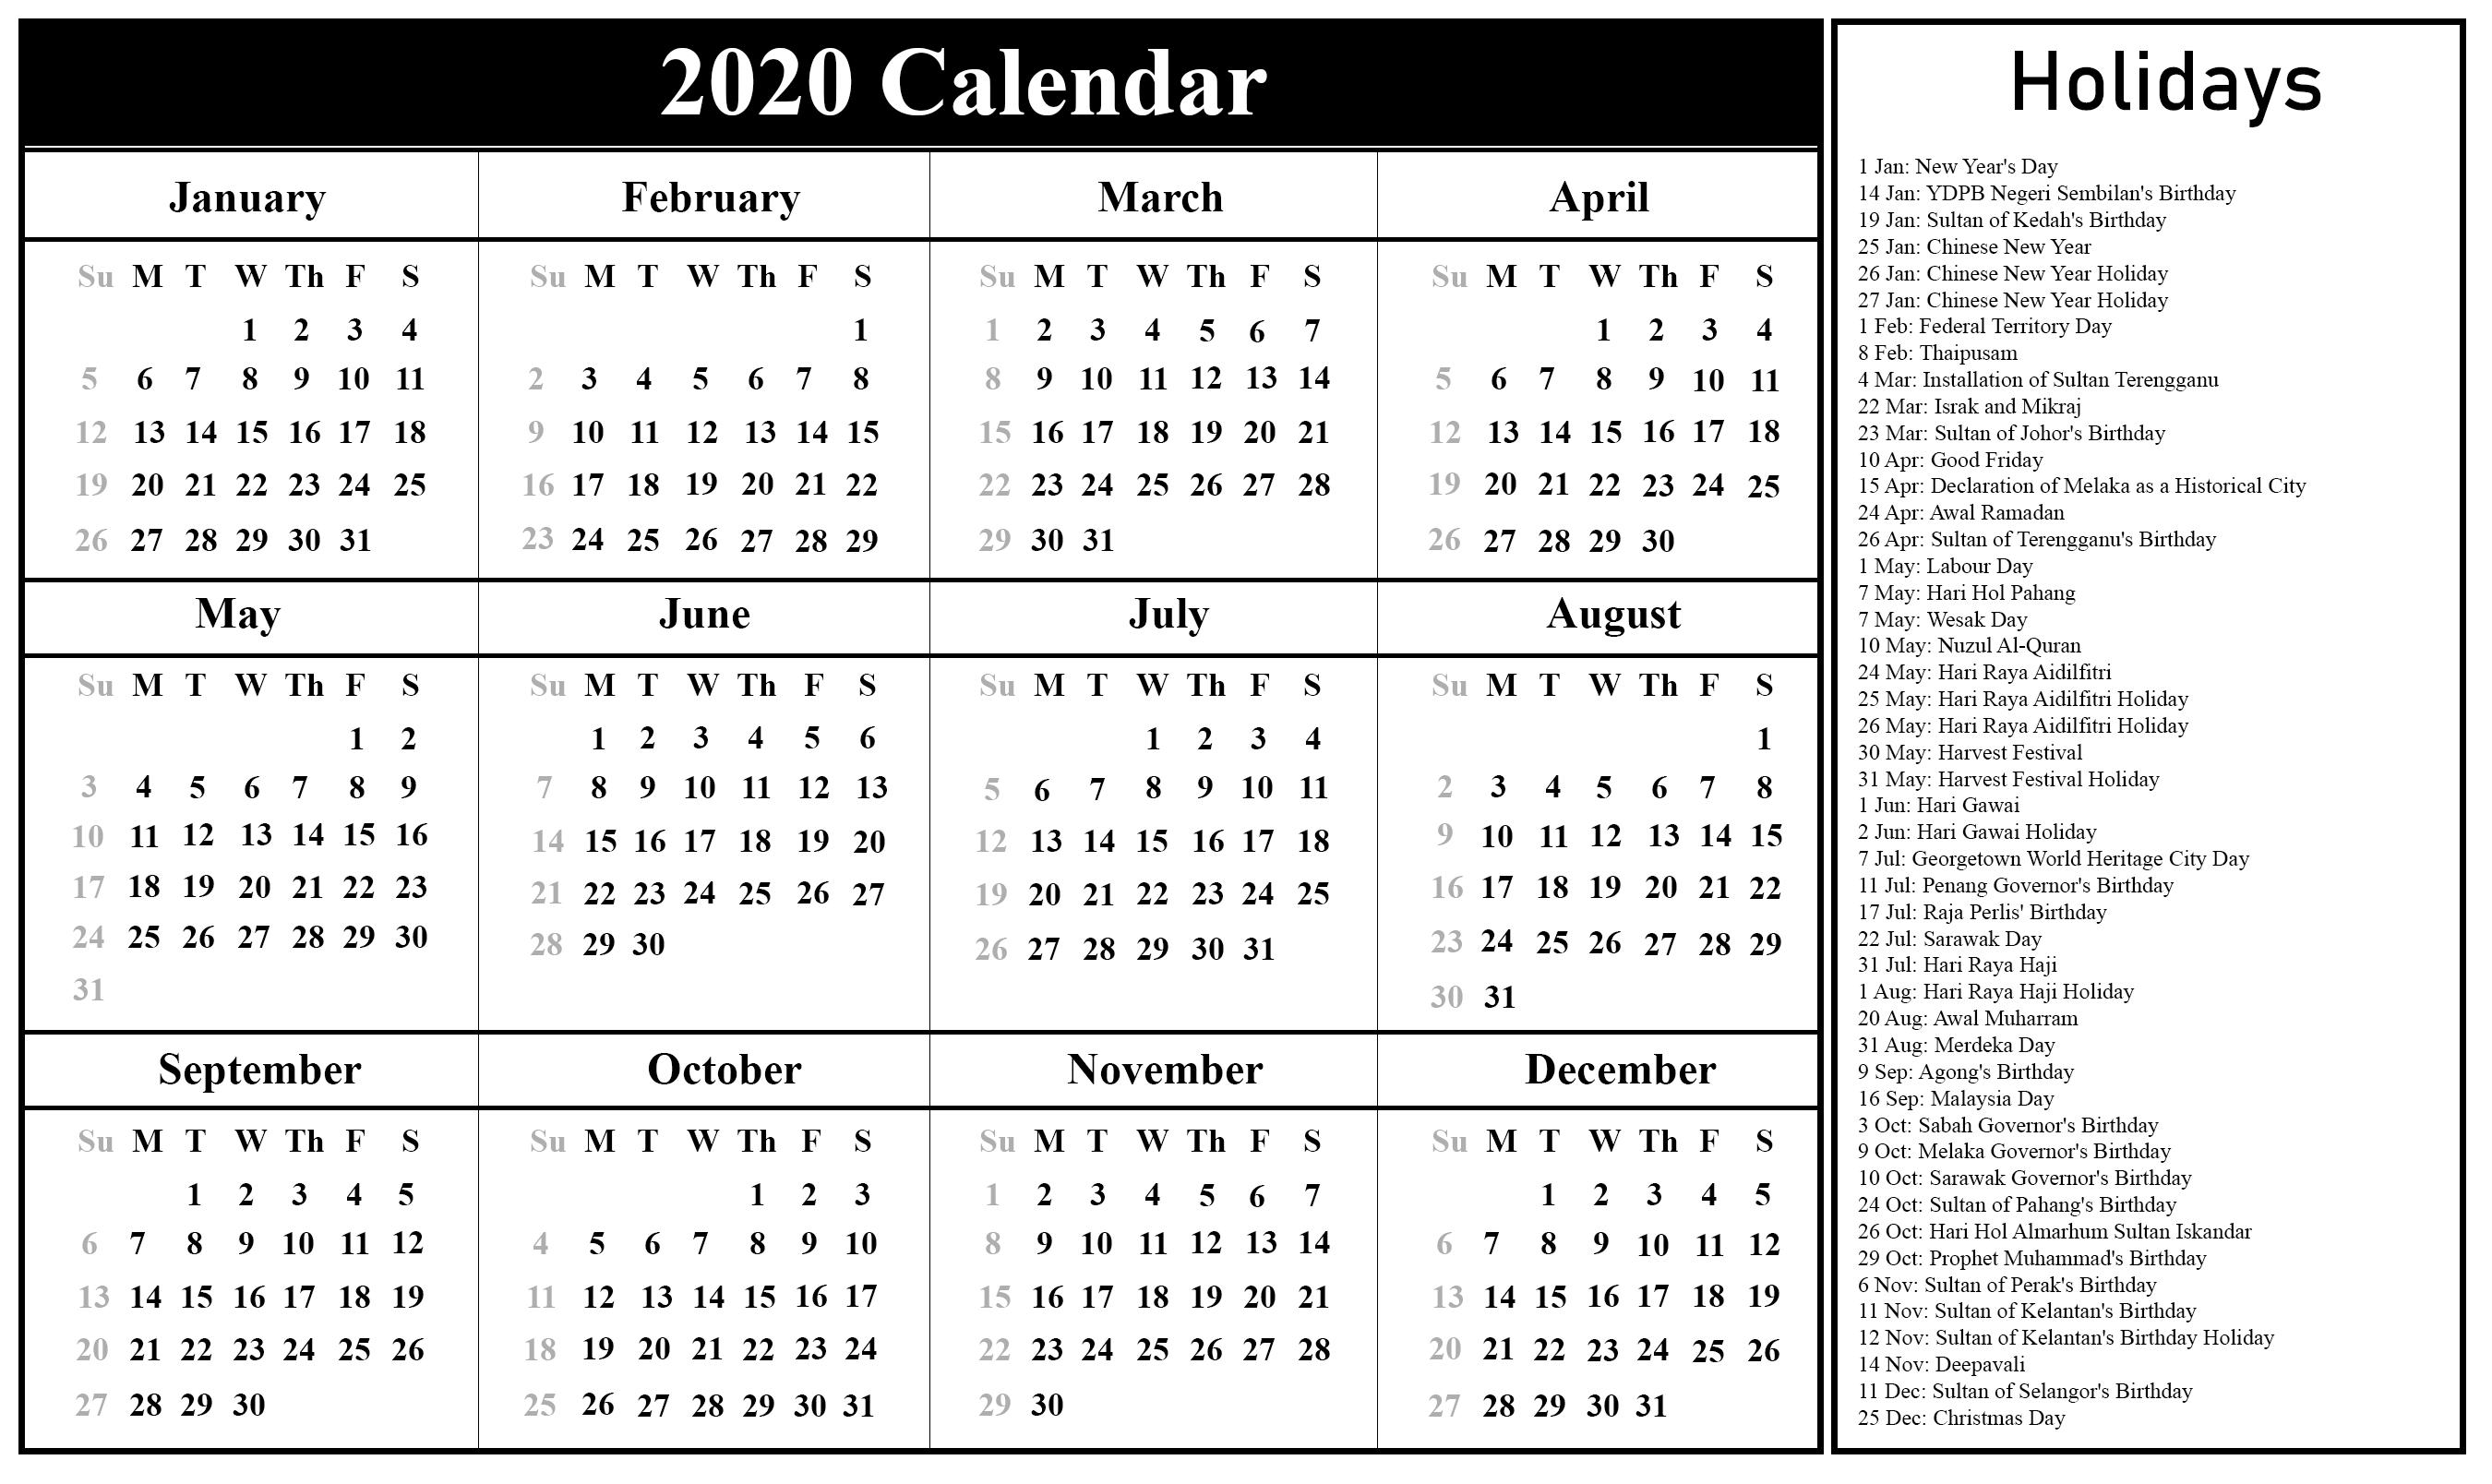 Free Blank Malaysia Calendar 2020 In Pdf, Excel & Word-Calendar For 2020 Indicating Public Holidays